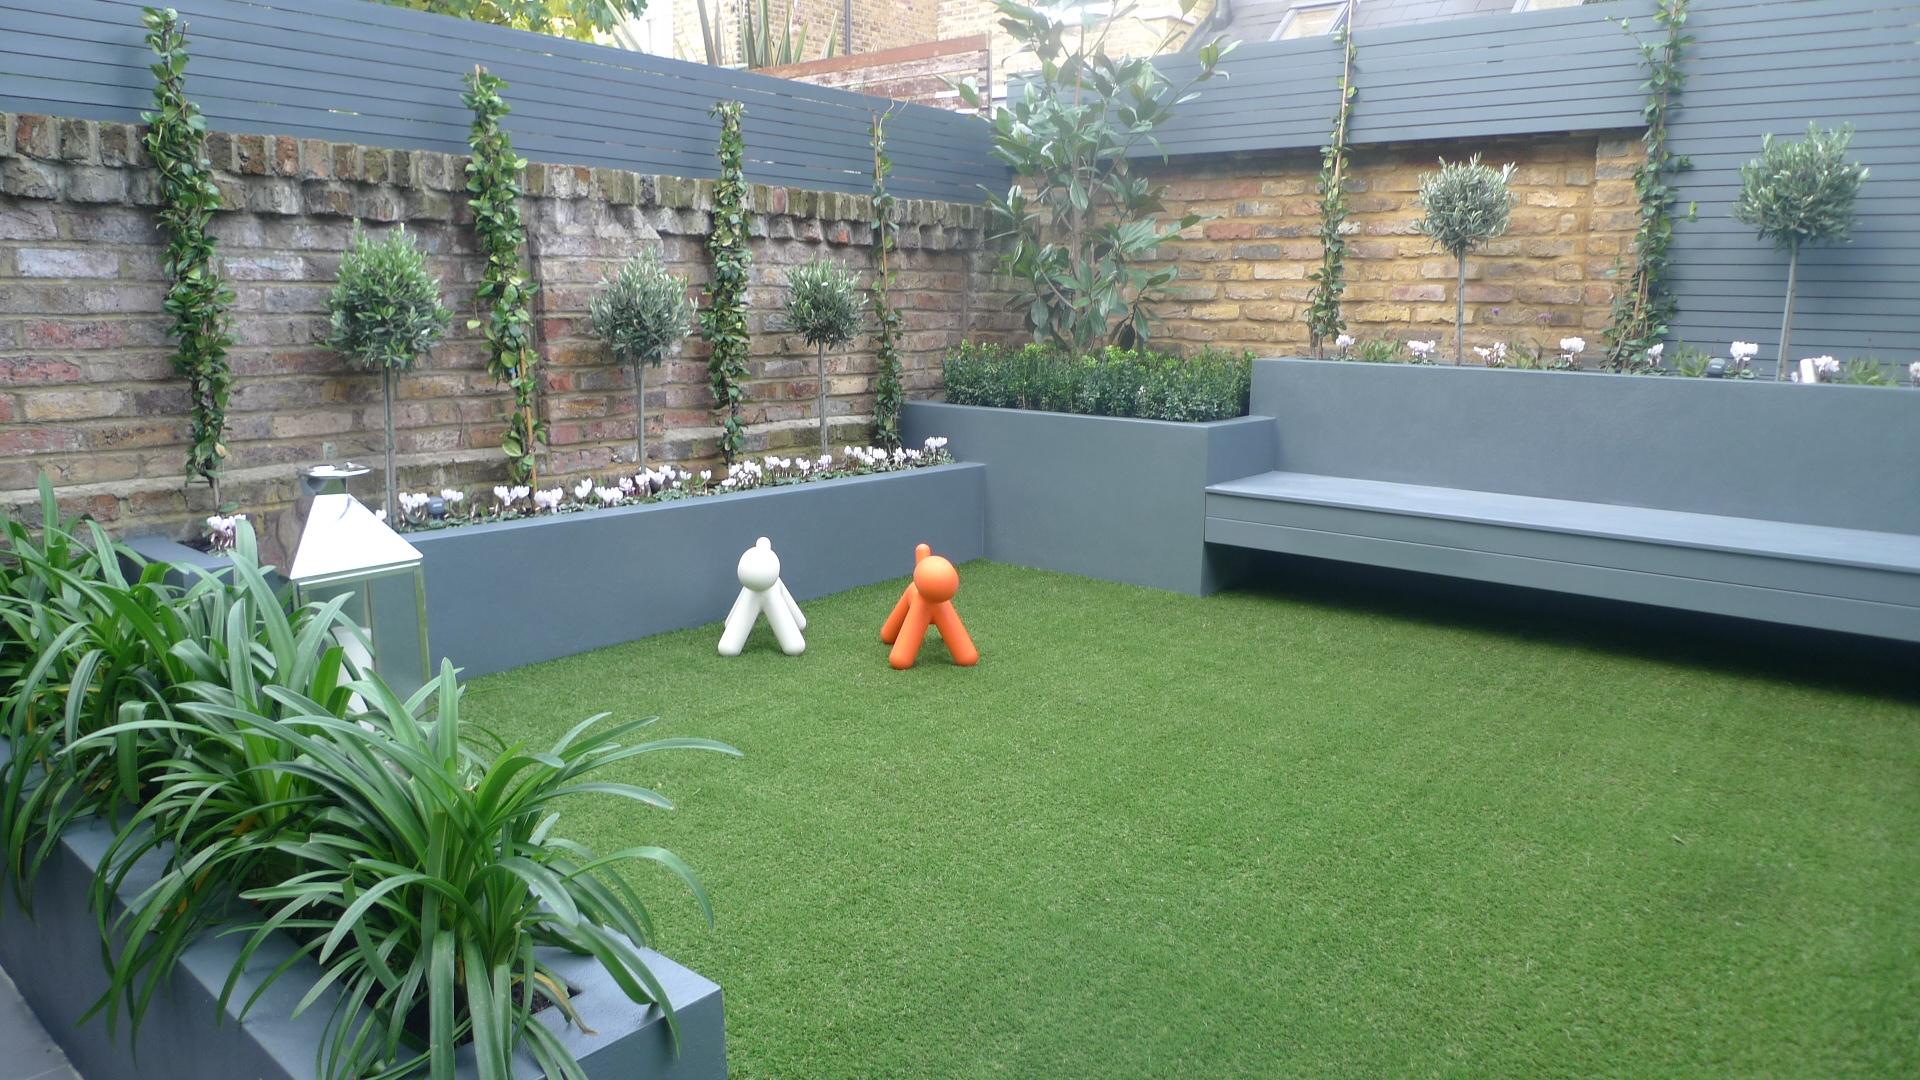 london garden design garden design. Black Bedroom Furniture Sets. Home Design Ideas